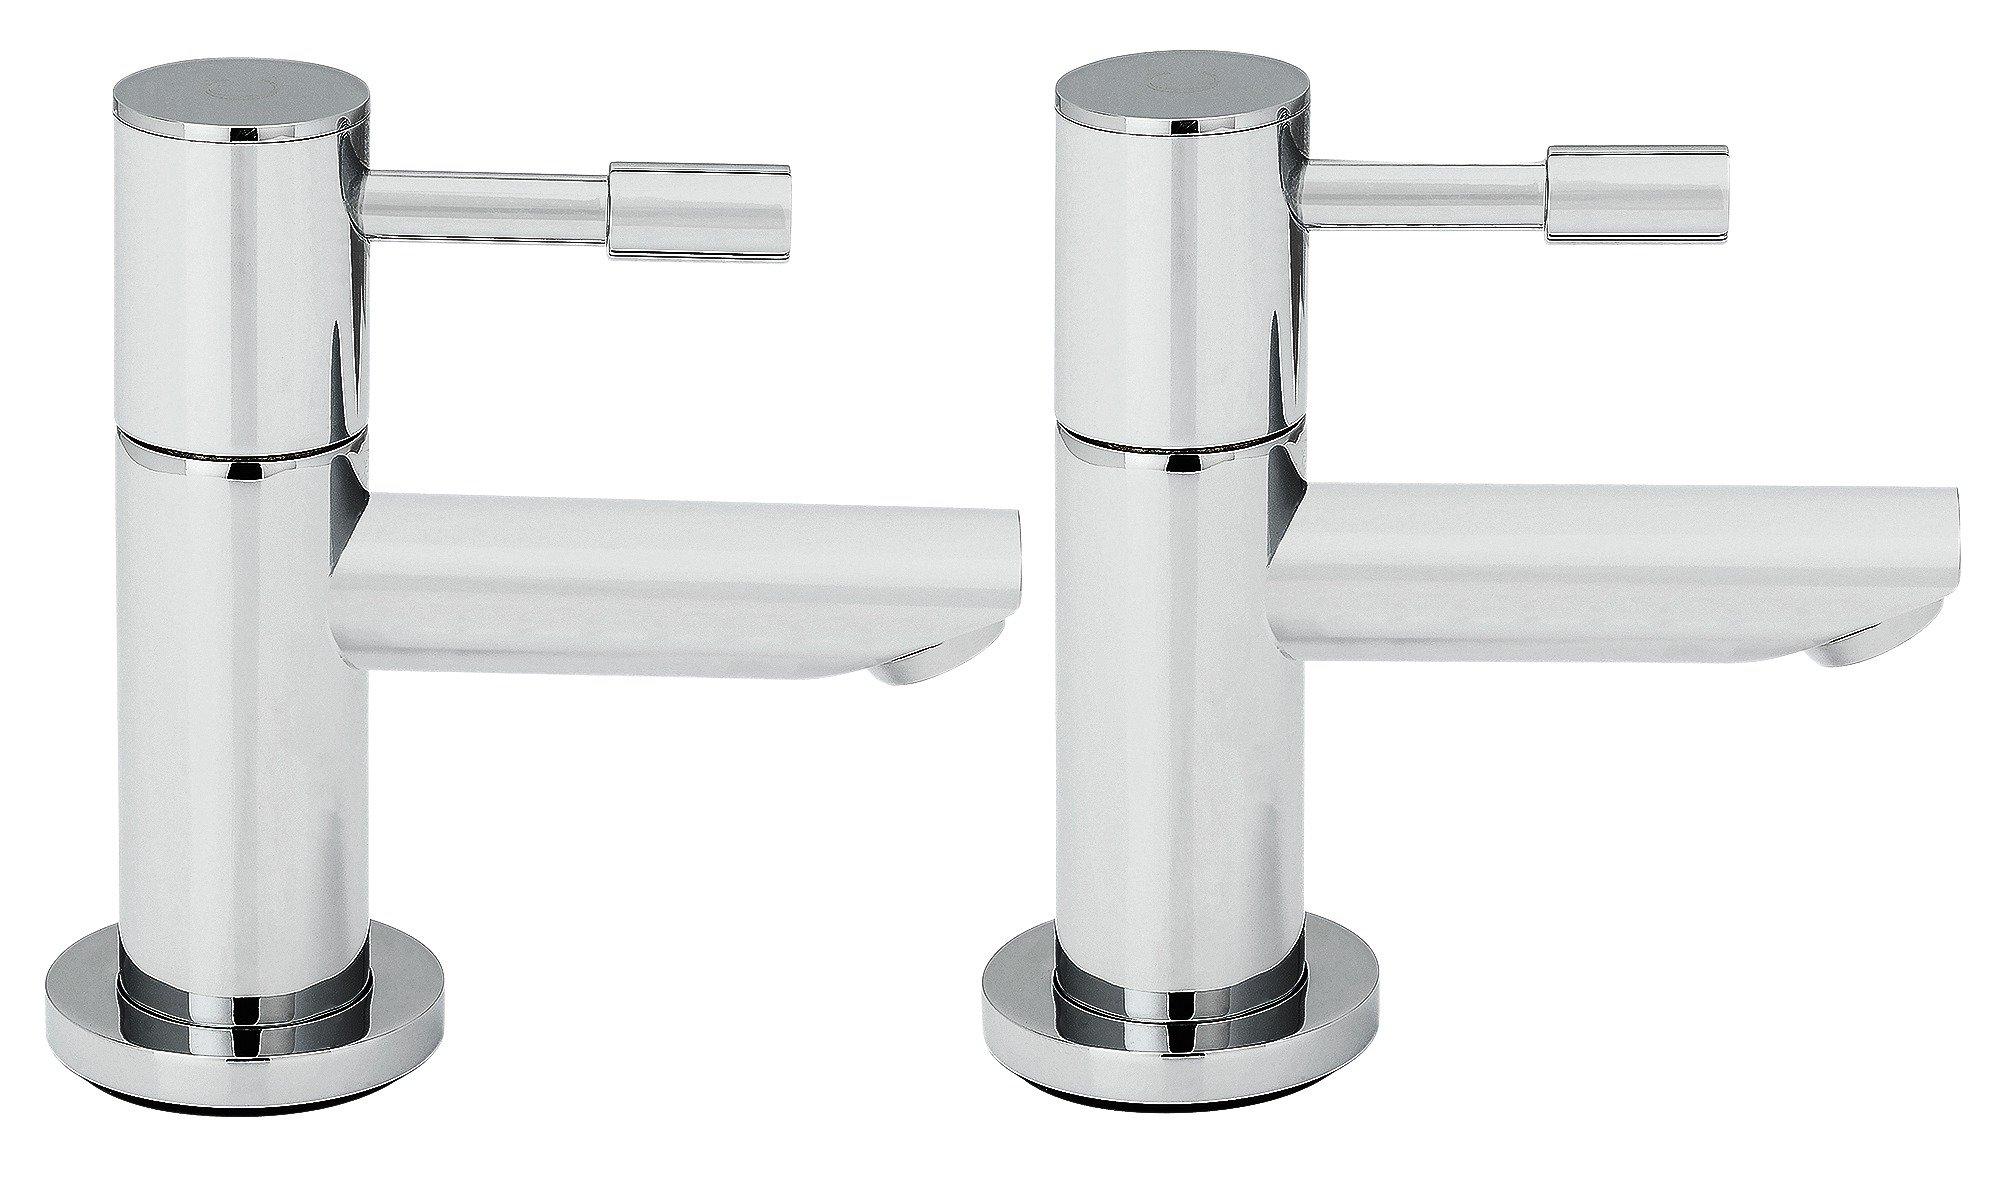 Argos Home Evoke Chrome Plated Basin Taps